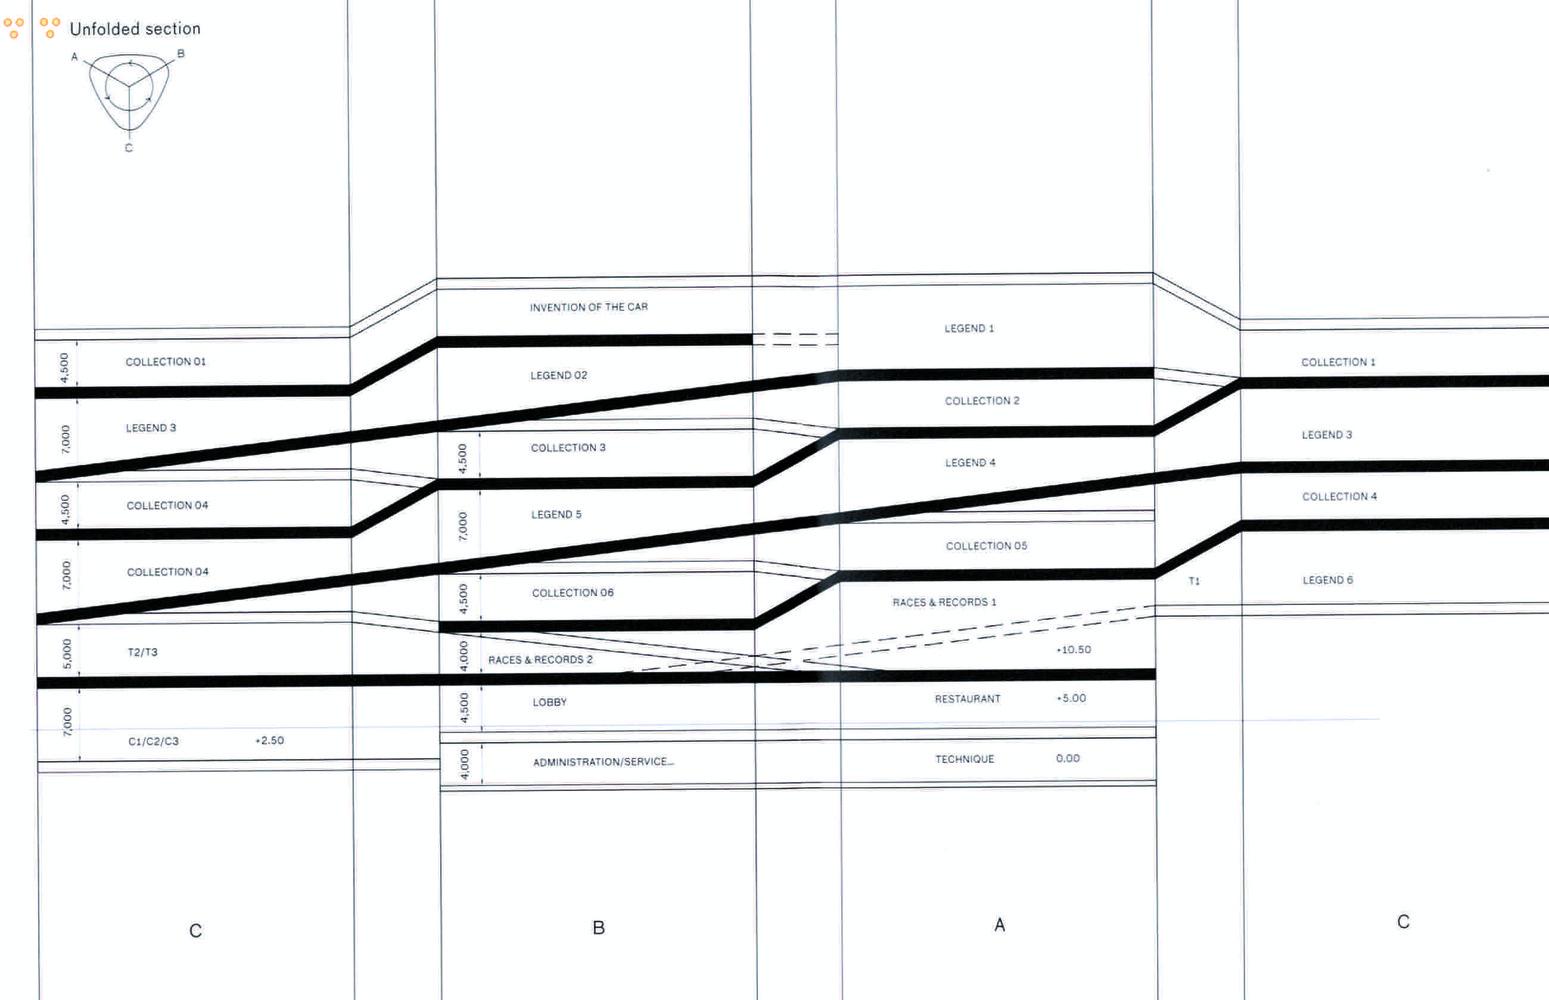 medium resolution of gallery of mercedes benz museum unstudio 23 1972 mercedes benz wiring diagrams mercedes benz diagram